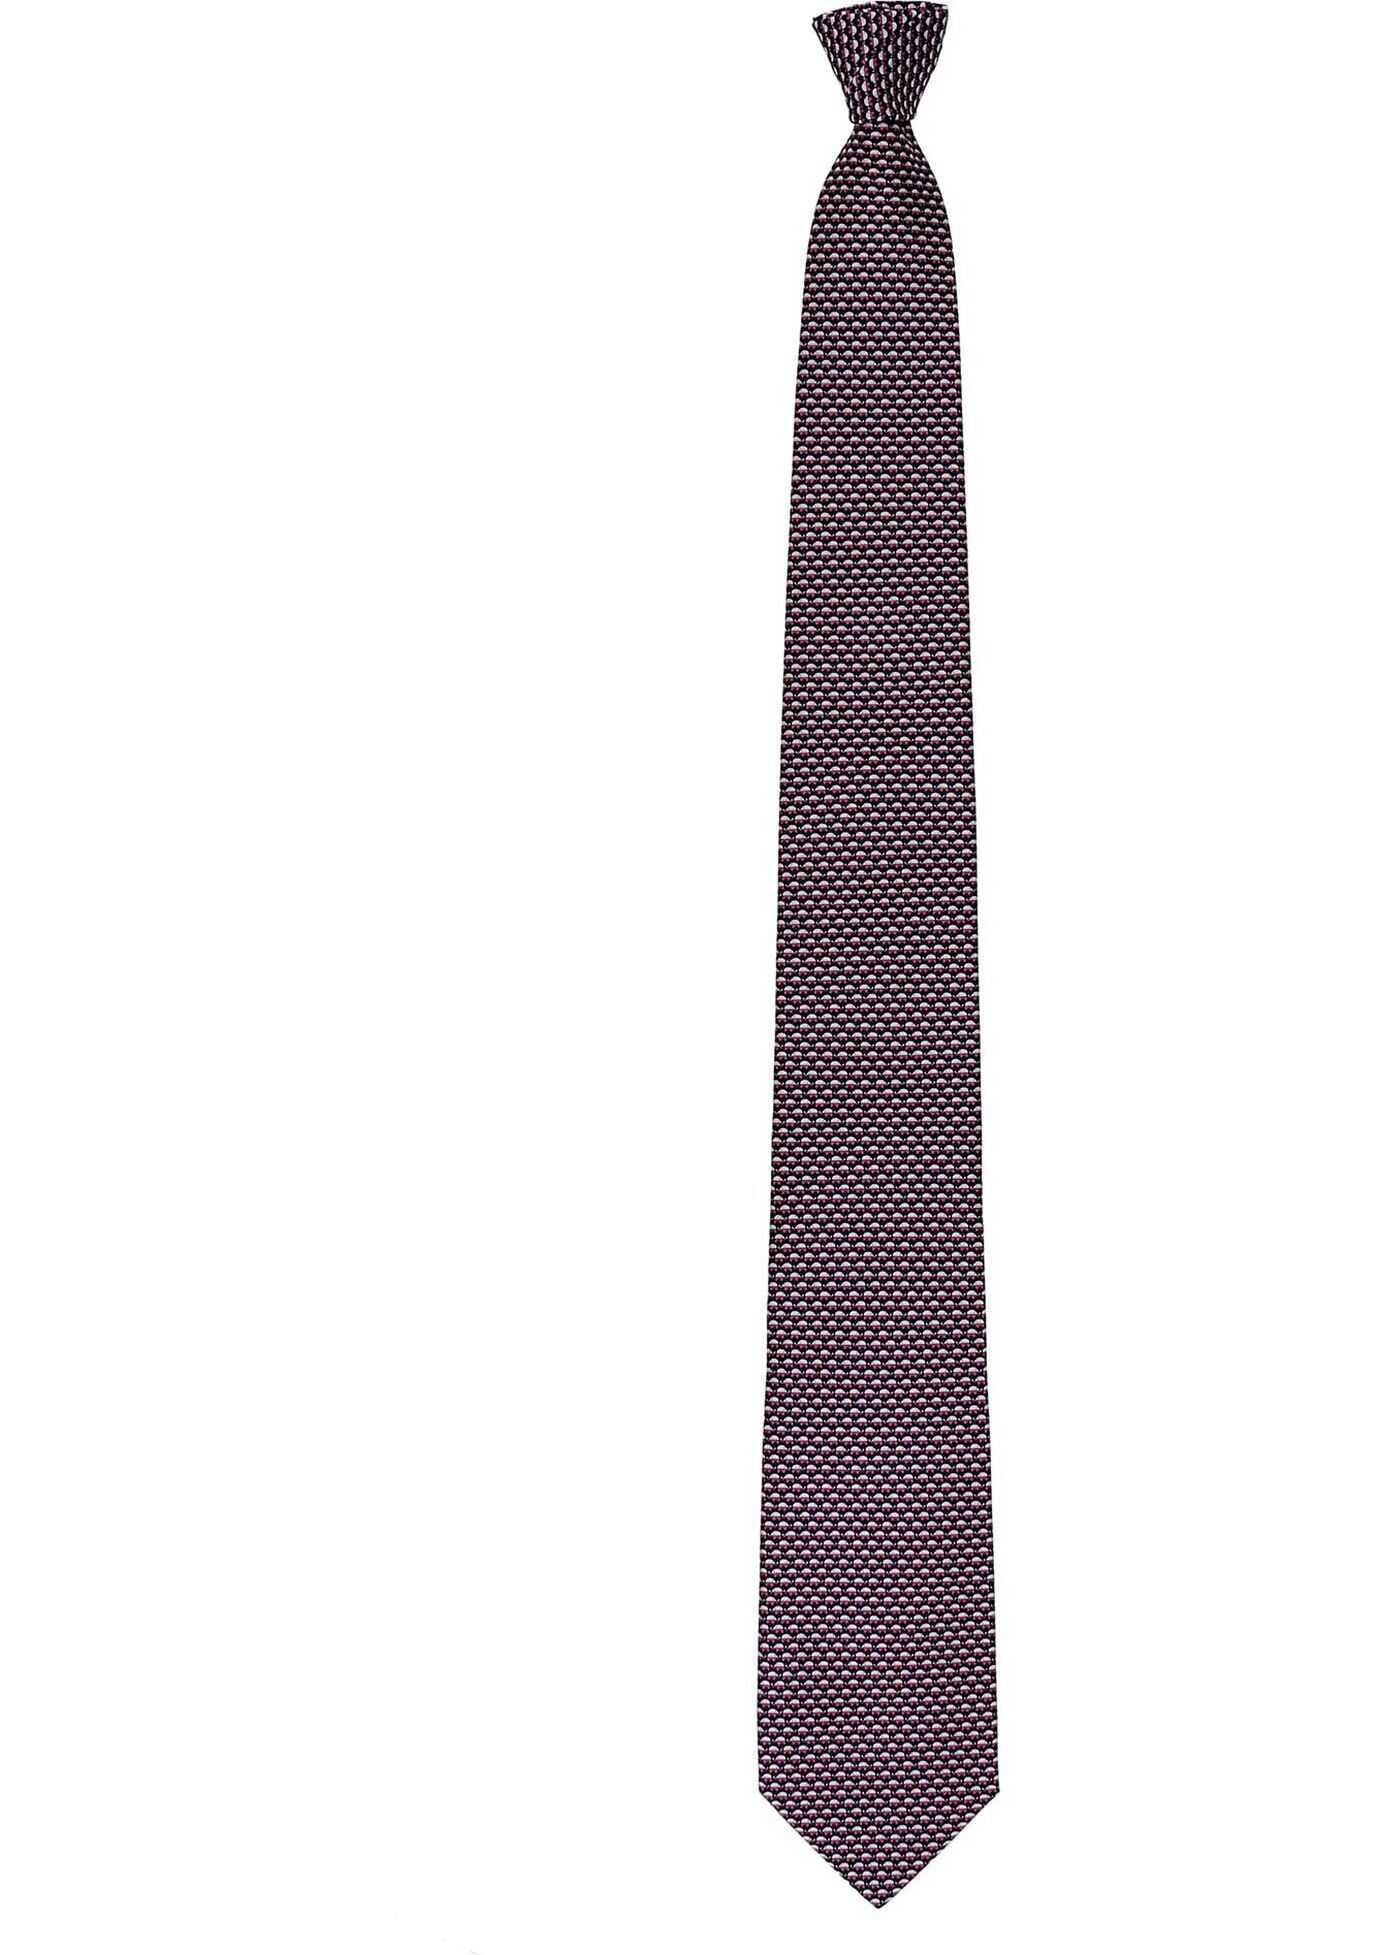 Salvatore Ferragamo Silk Tie MULTICOLOR